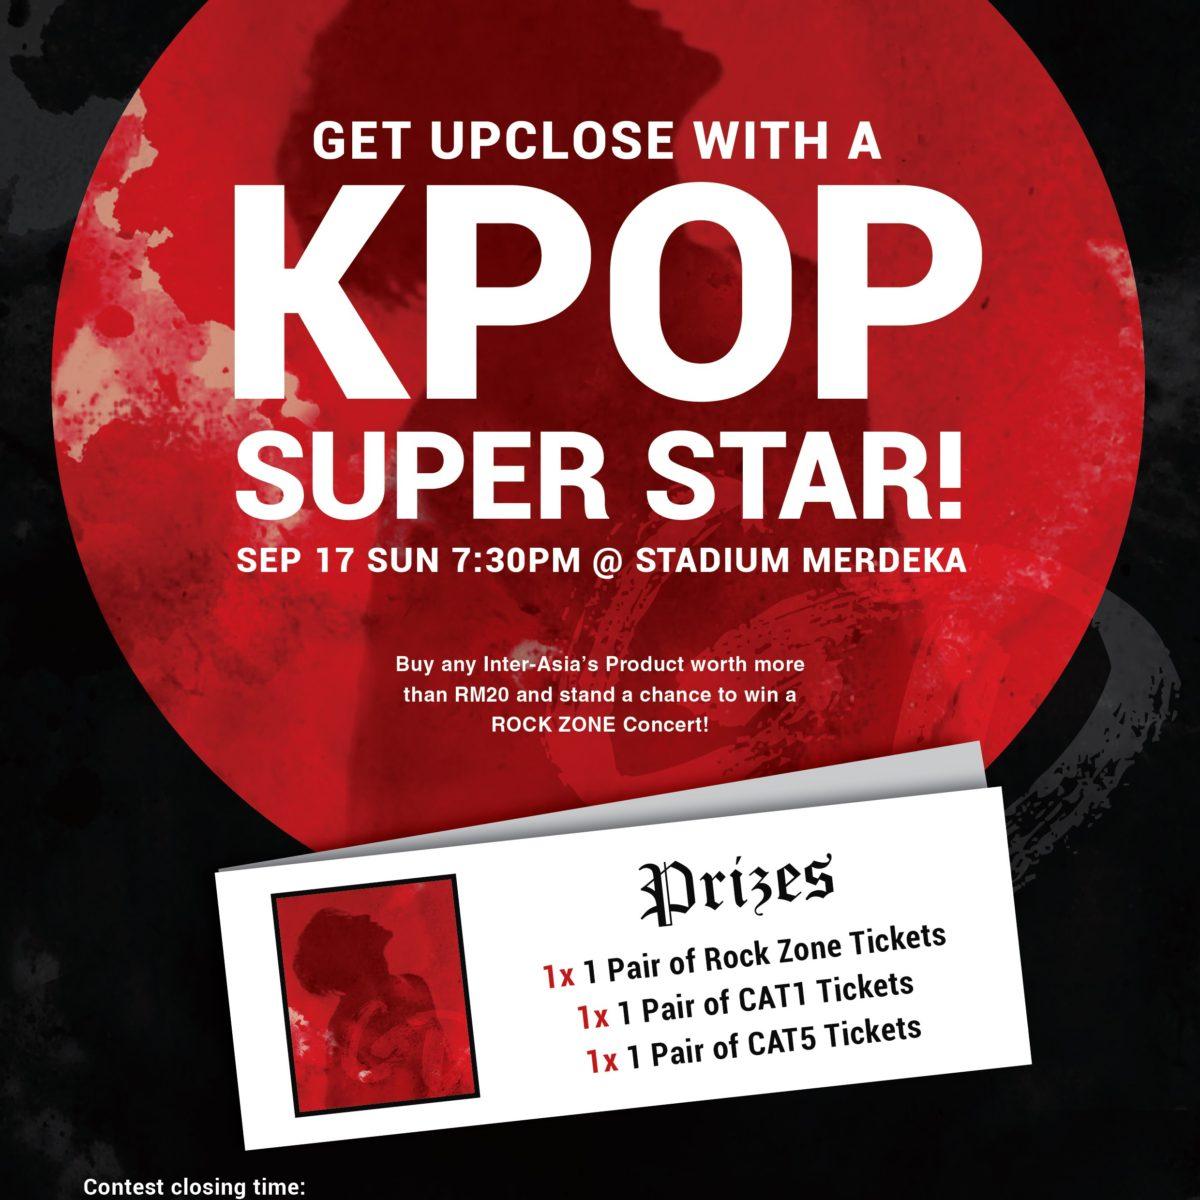 GET UP CLOSE WITH A KOREAN SUPER STAR!